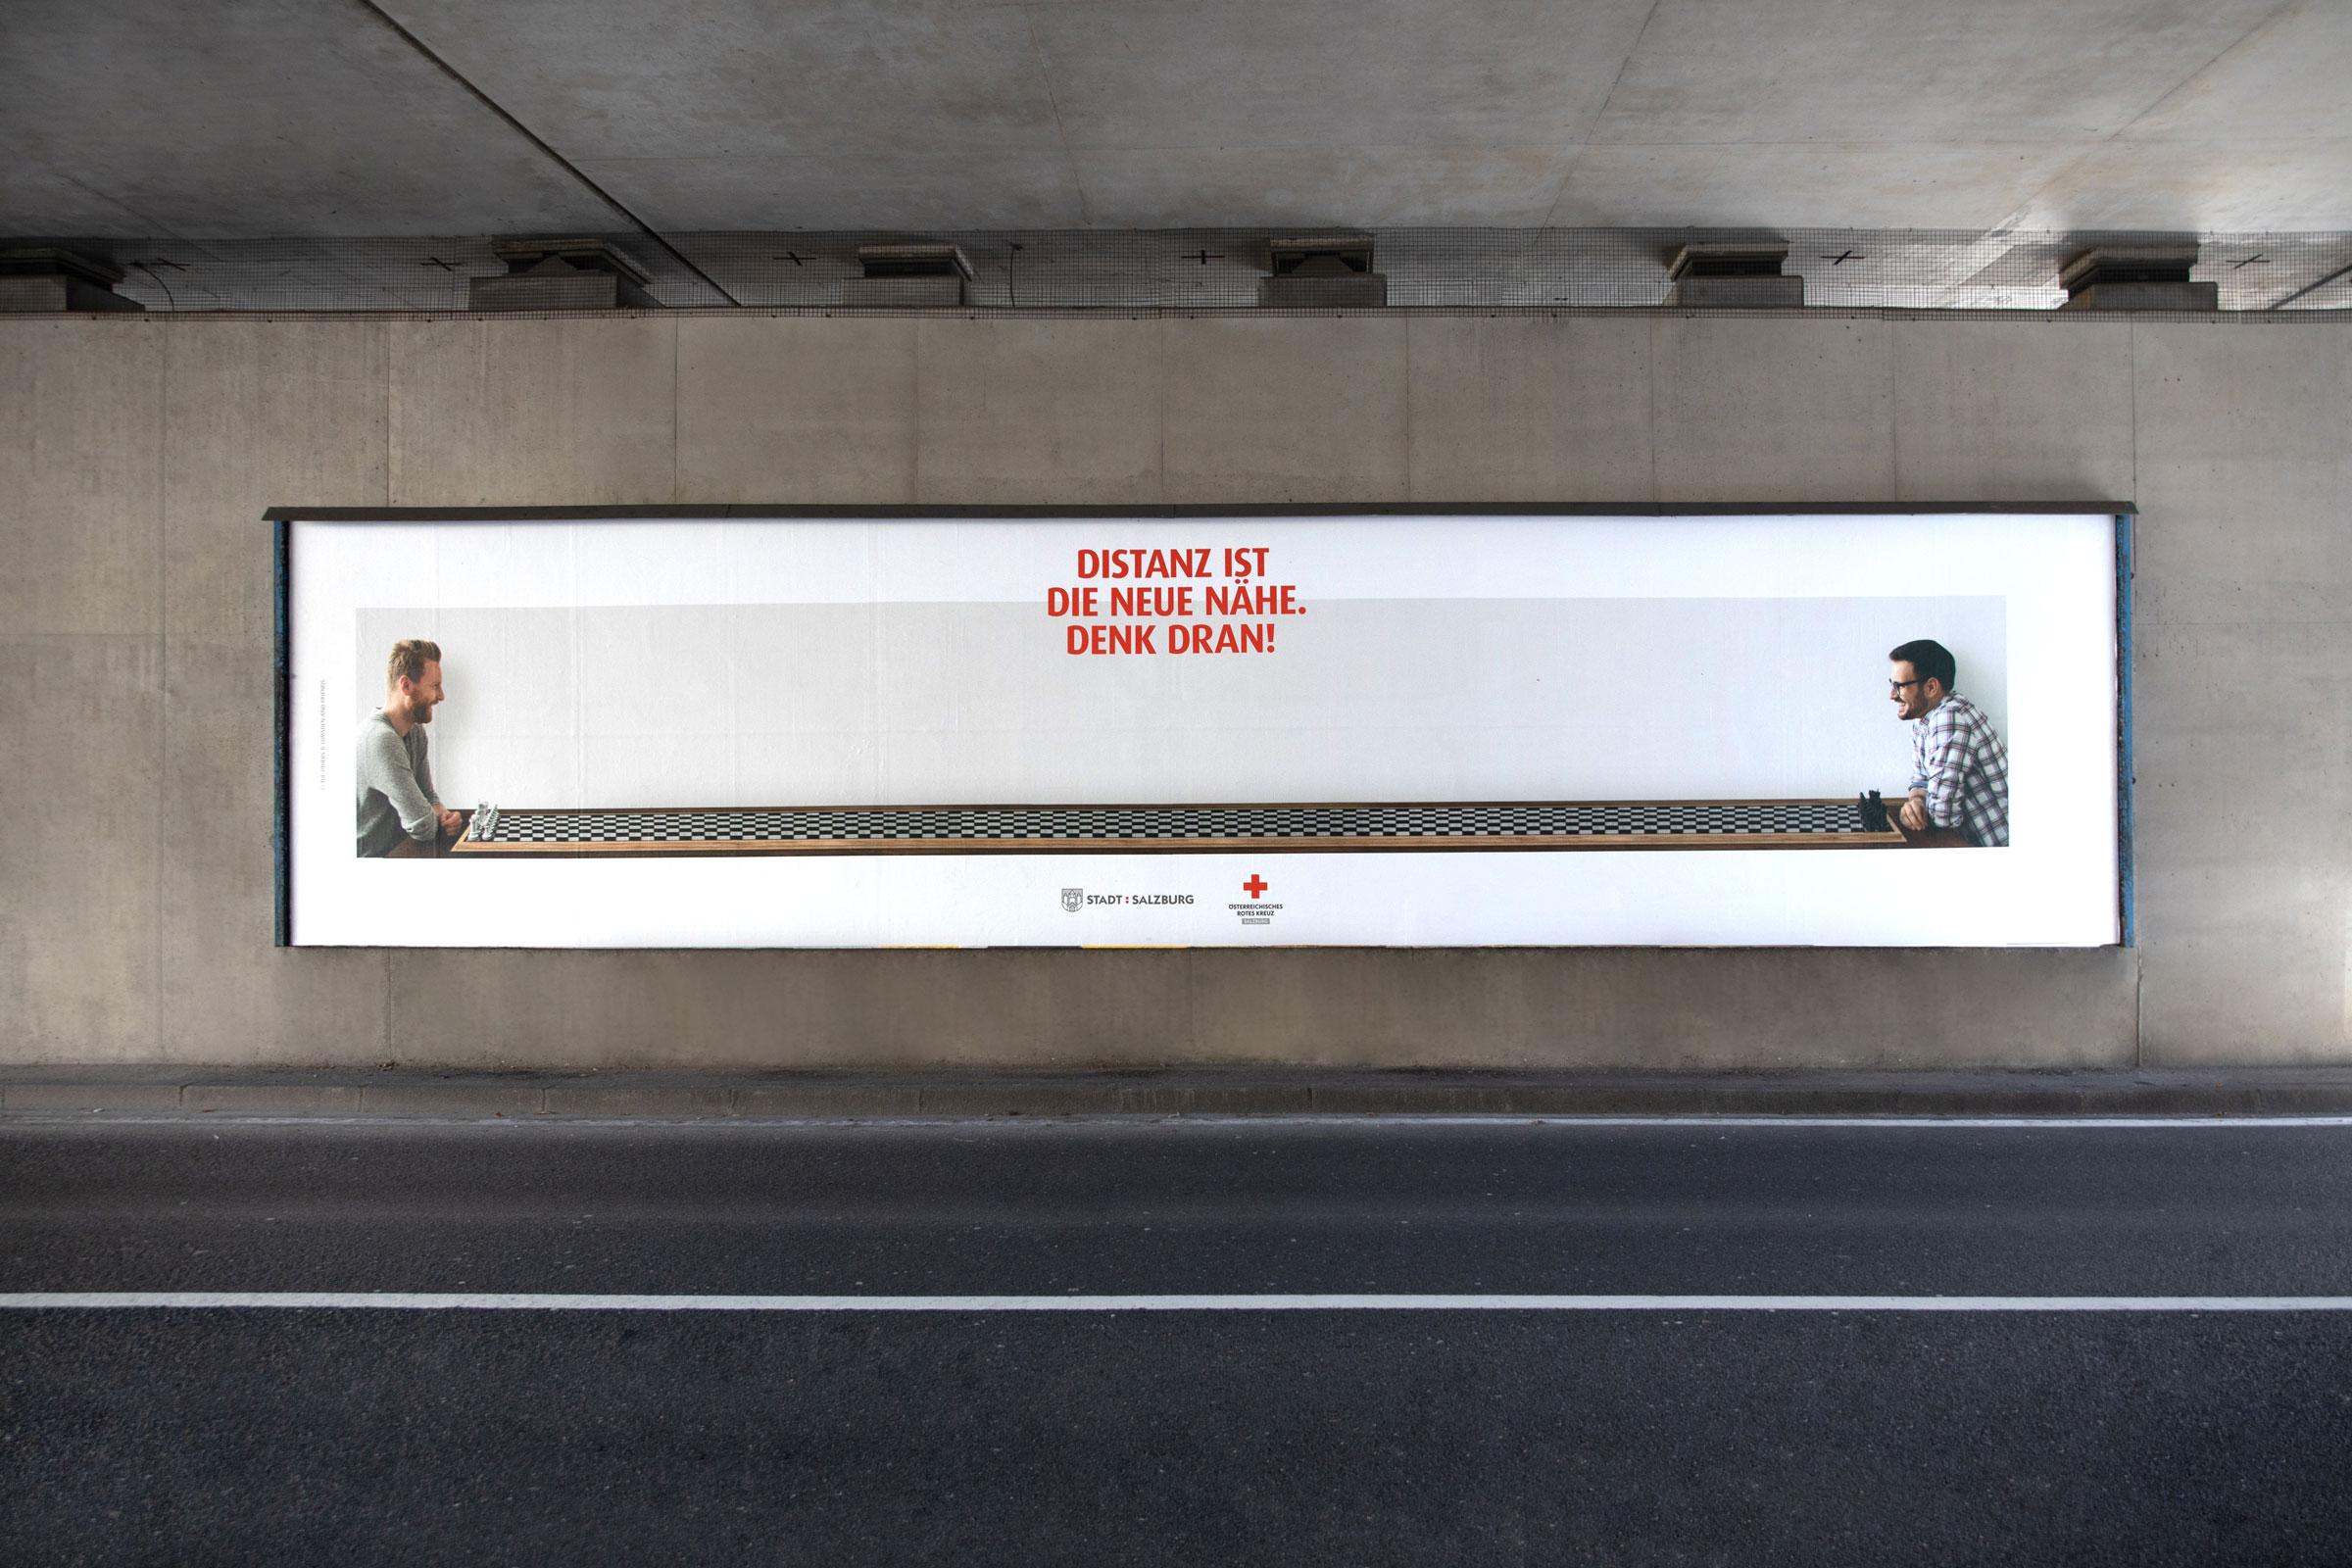 Rotes_Kreuz_Abstandskampagne_Plakatwand_02